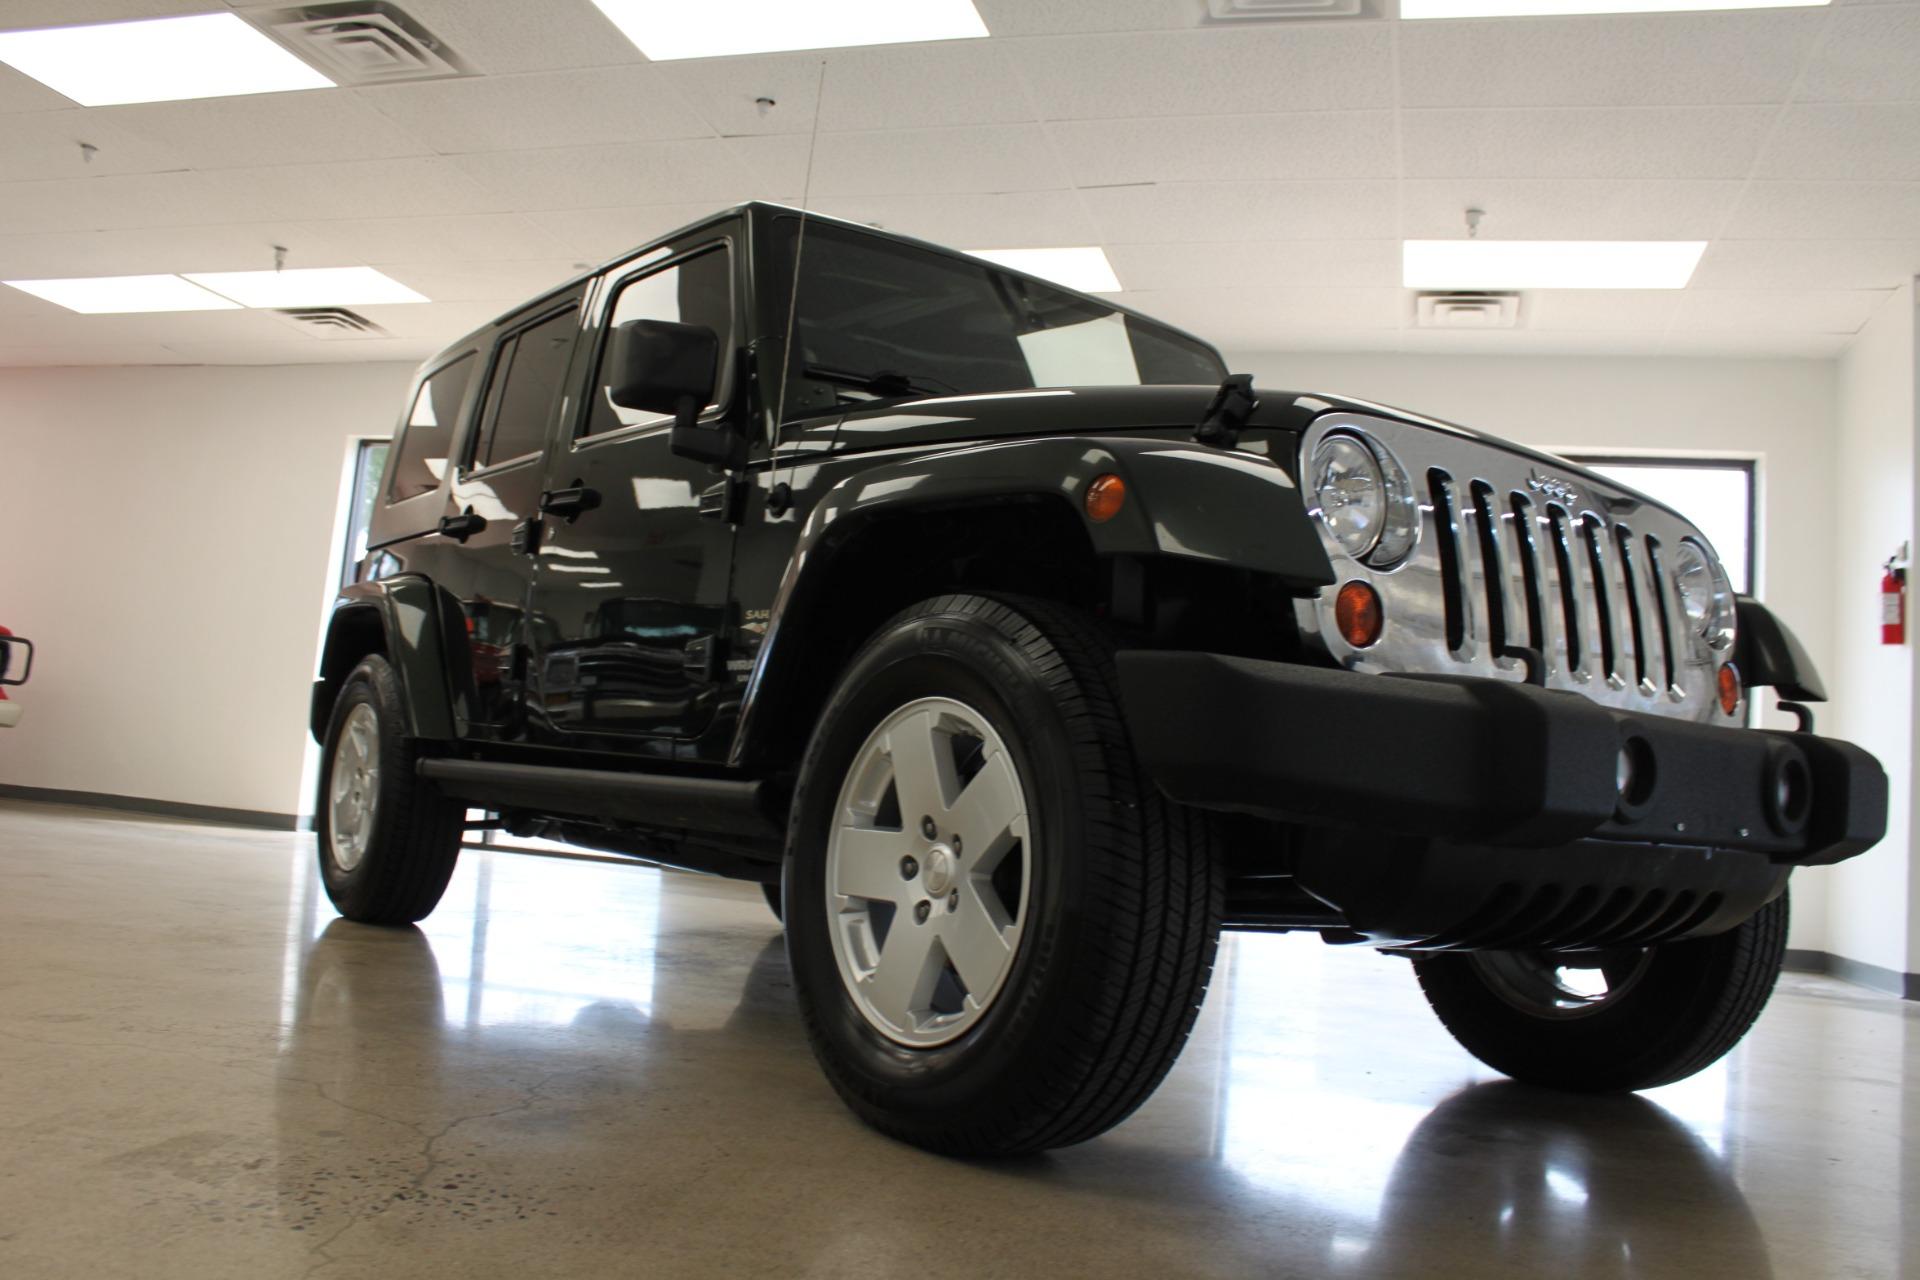 Used-2010-Jeep-Wrangler-Unlimited-Sahara-4X4-Alfa-Romeo